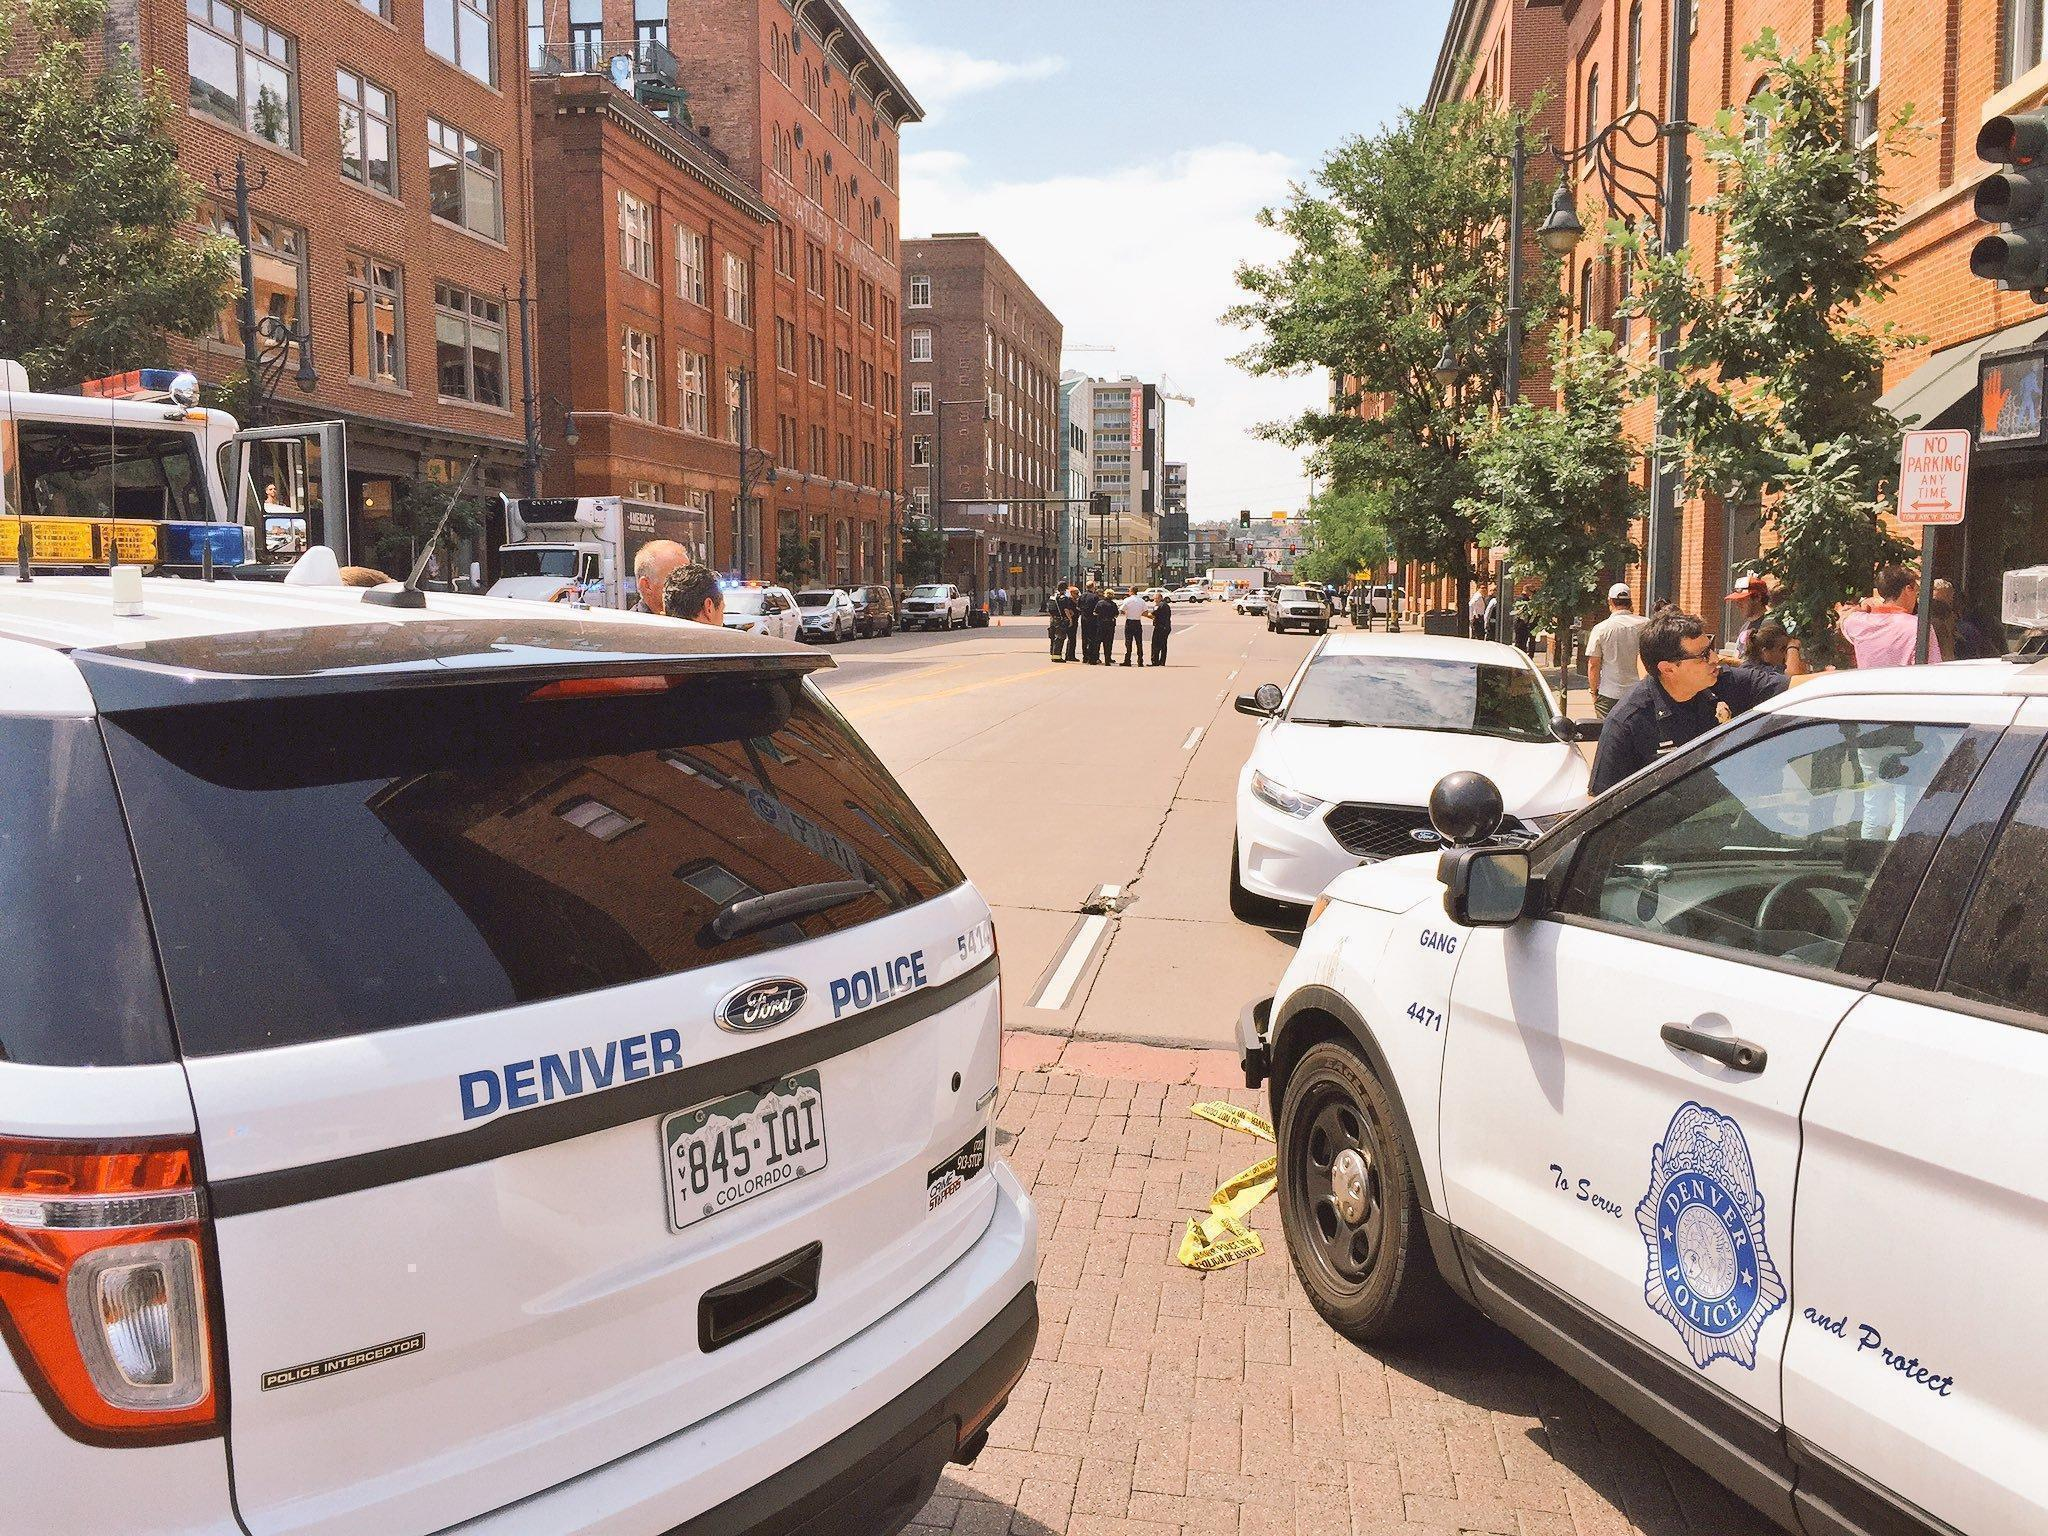 Gunman shoots woman in Denver office building, then kills himself